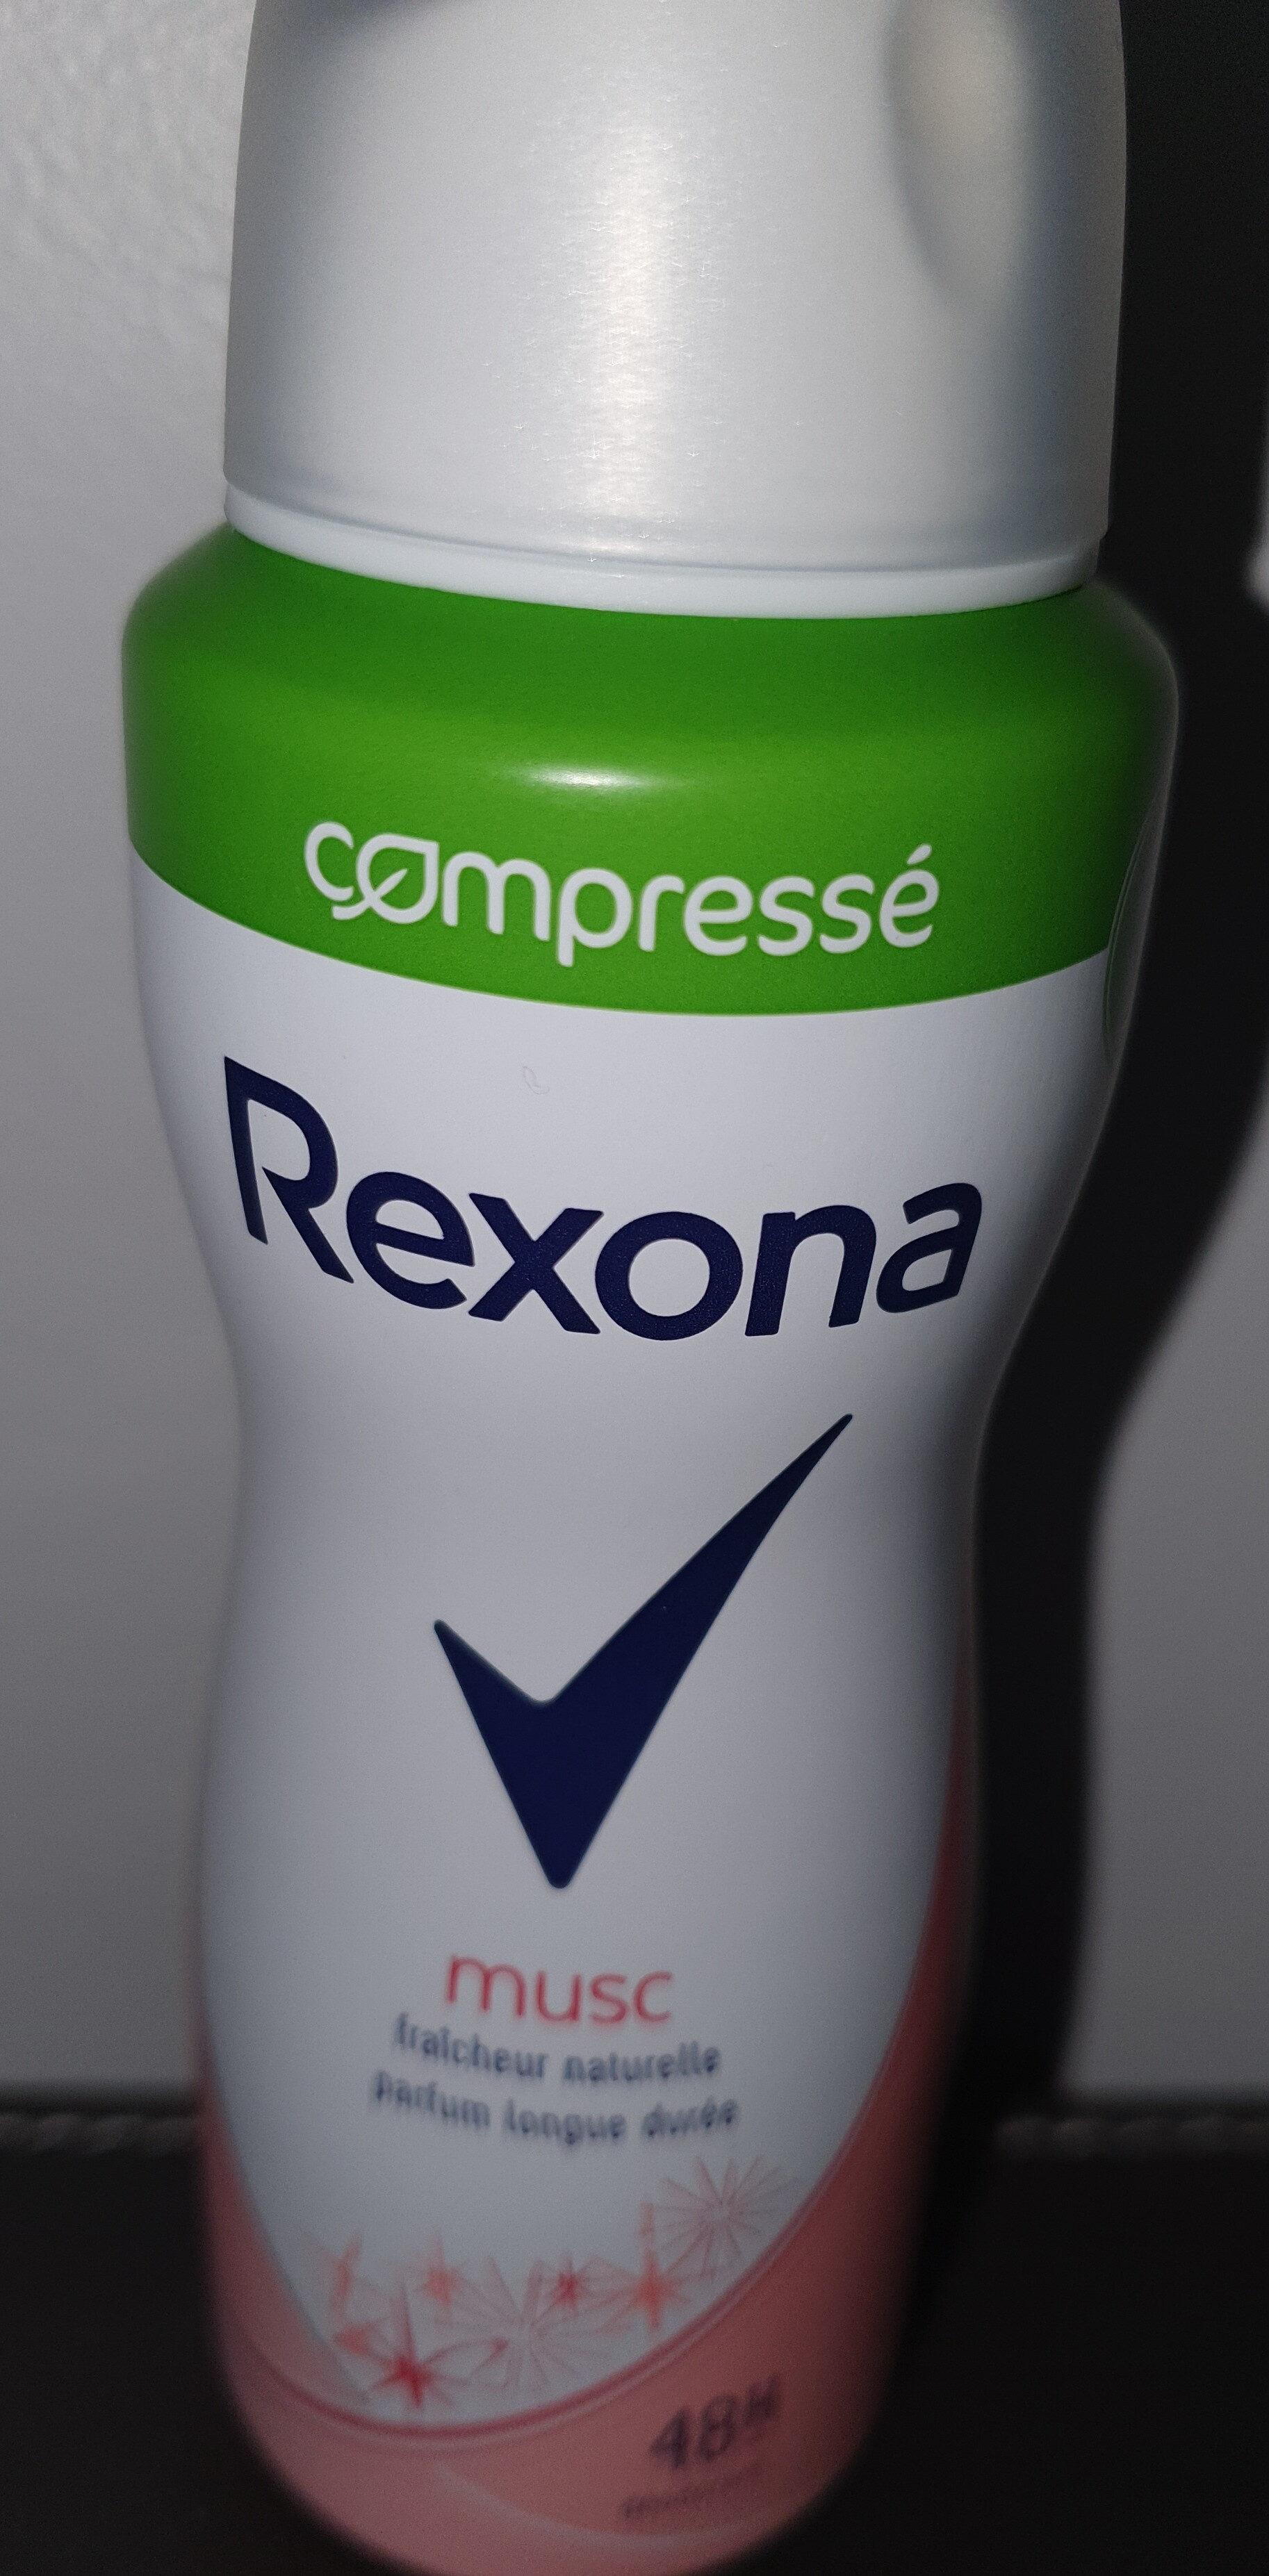 REXONA Déodorant Femme Spray Antibactérien Musc Compressé - Ingredients - fr